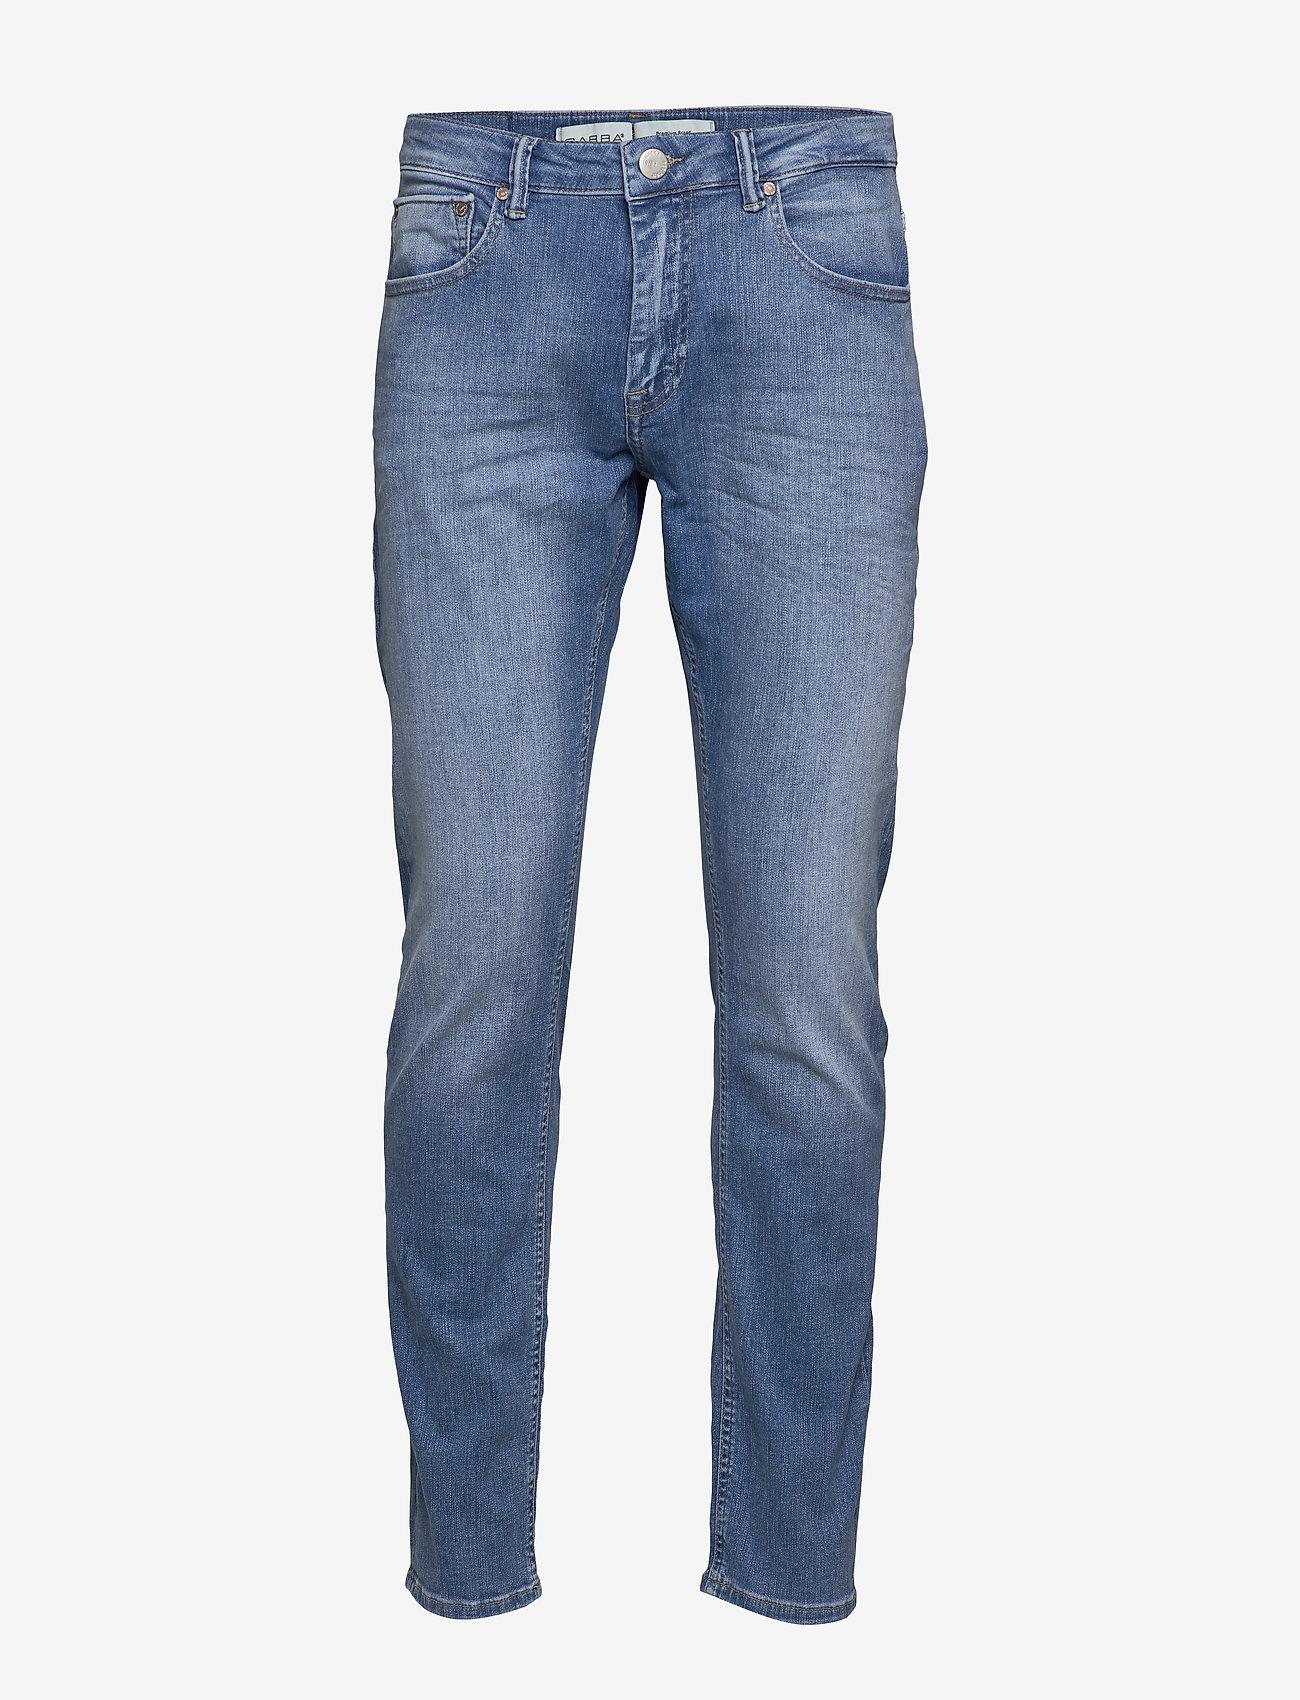 Gabba - Jones K2615 Lt. - slim jeans - rs1257 - 0